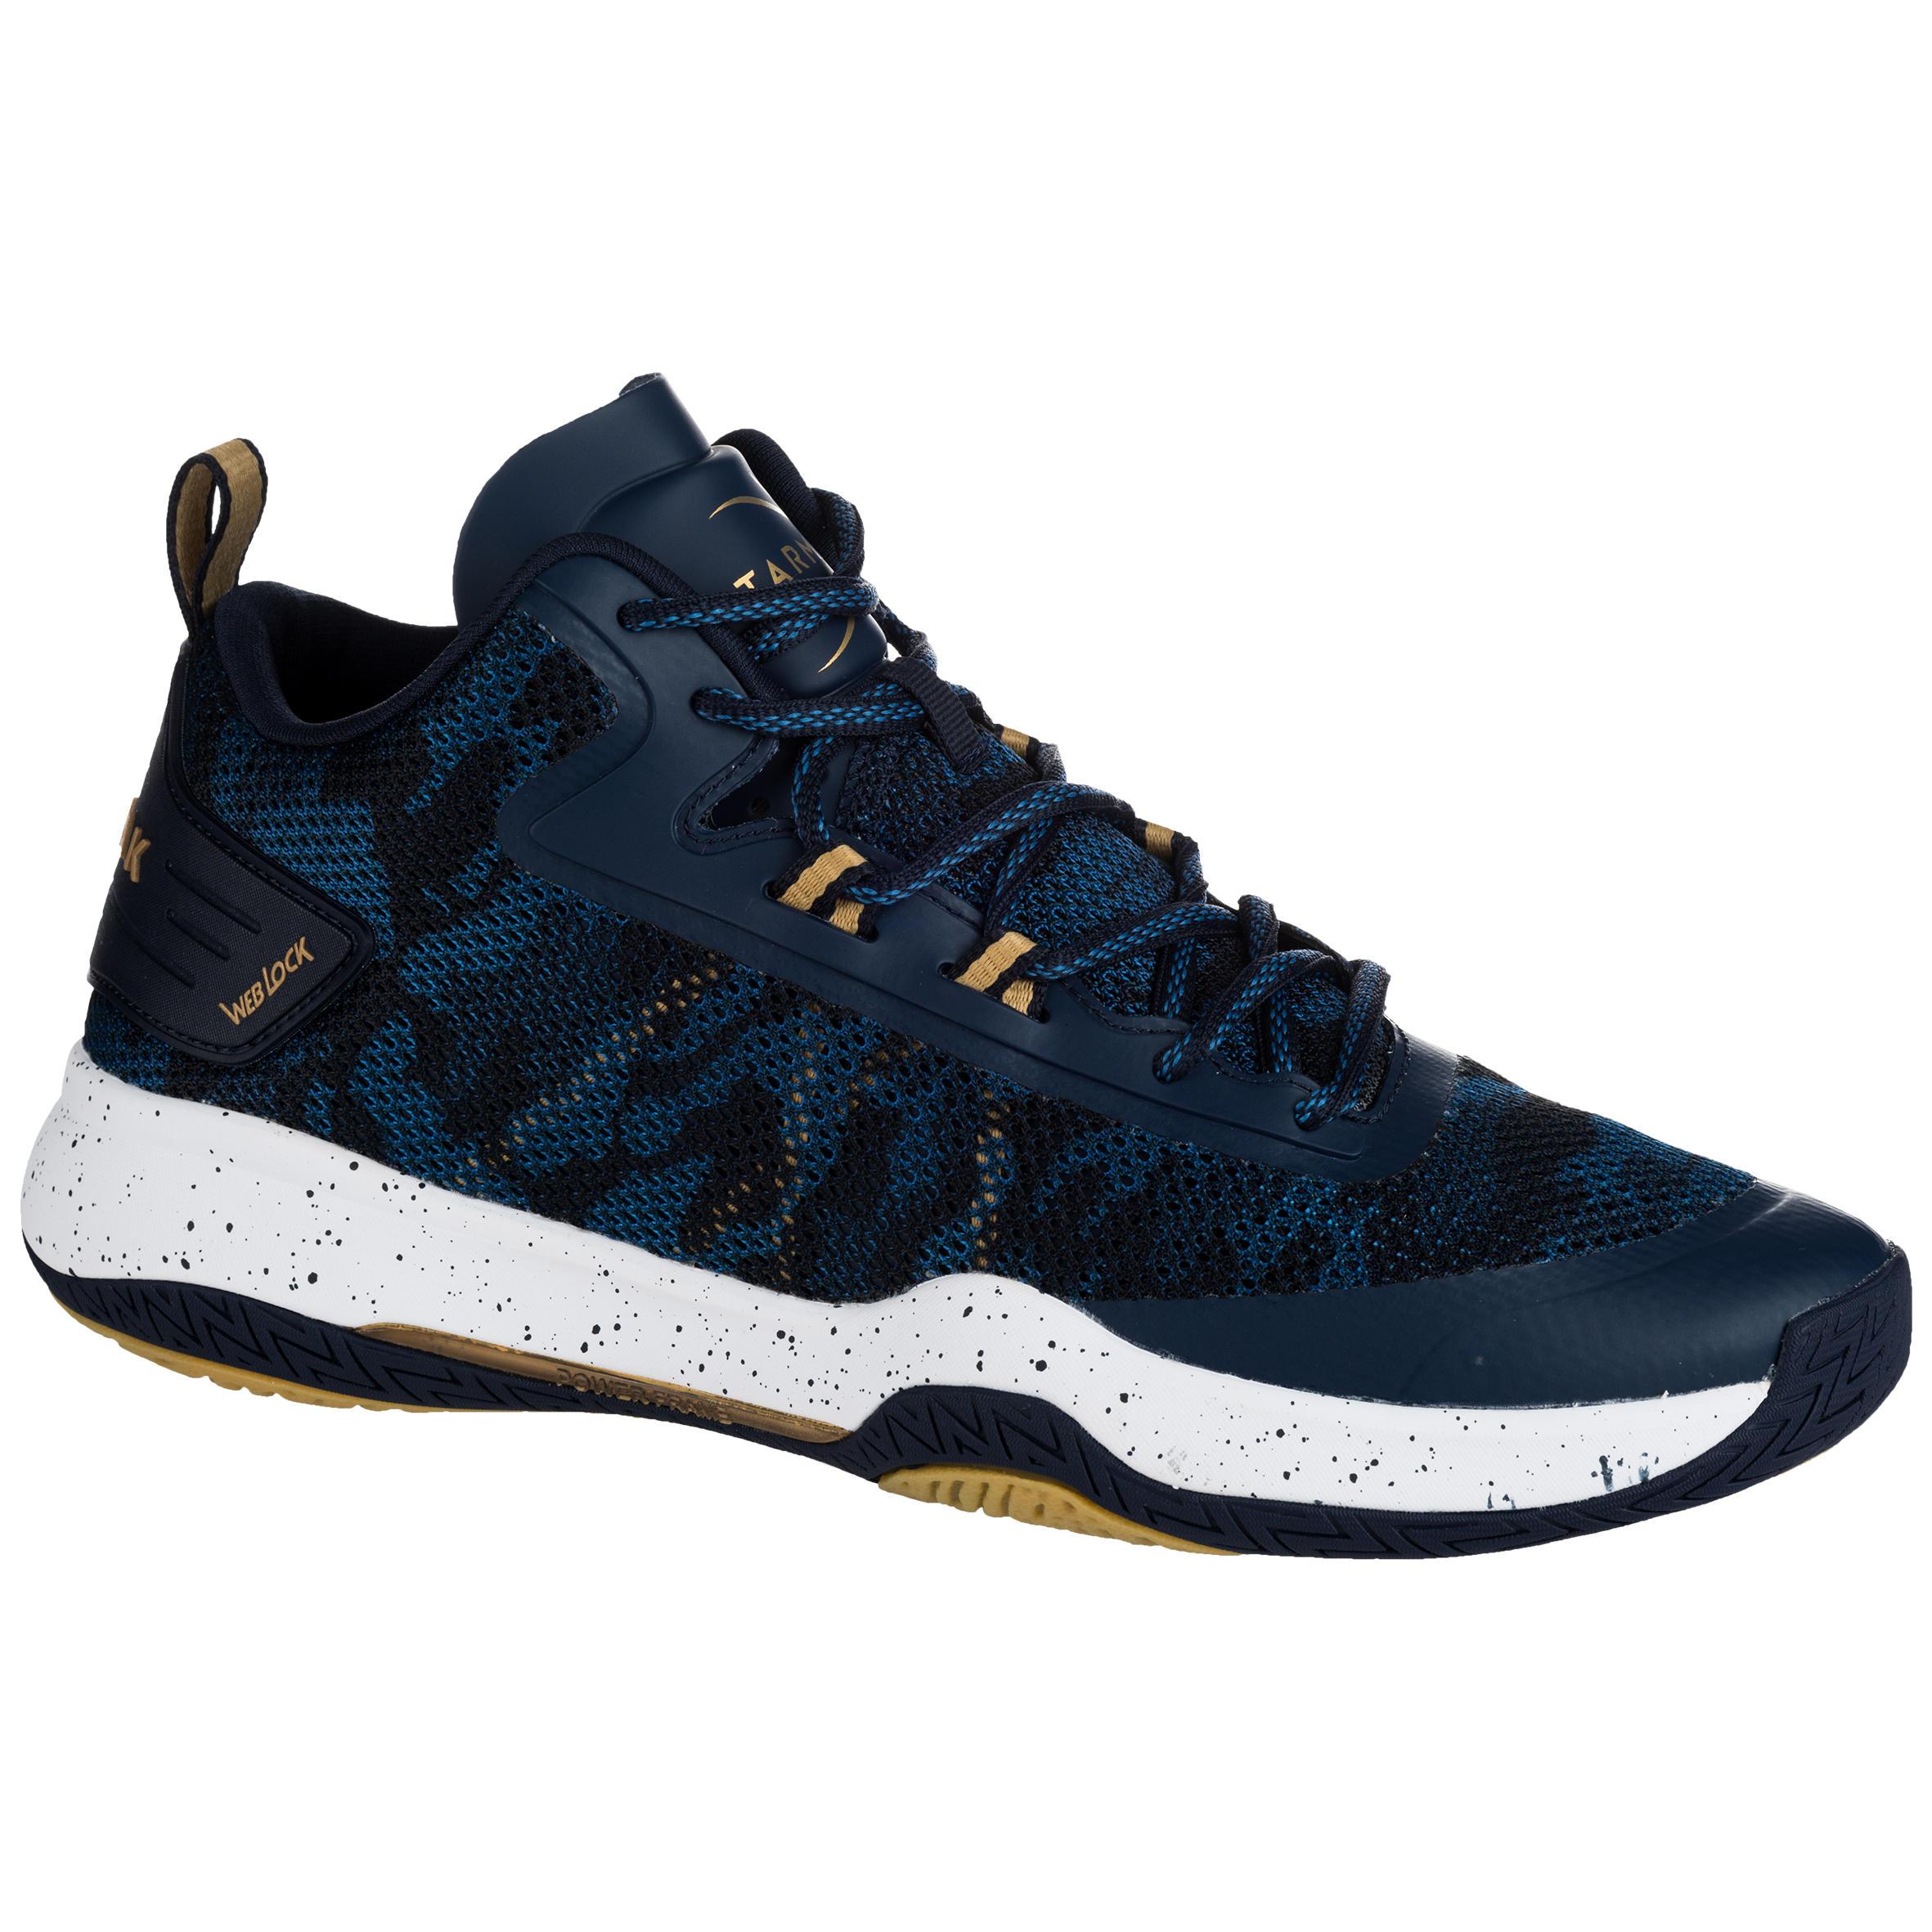 Basketballschuhe SC500 Mid Erwachsene Fortgeschrittene blau/gold | Schuhe > Sportschuhe > Basketballschuhe | Tarmak